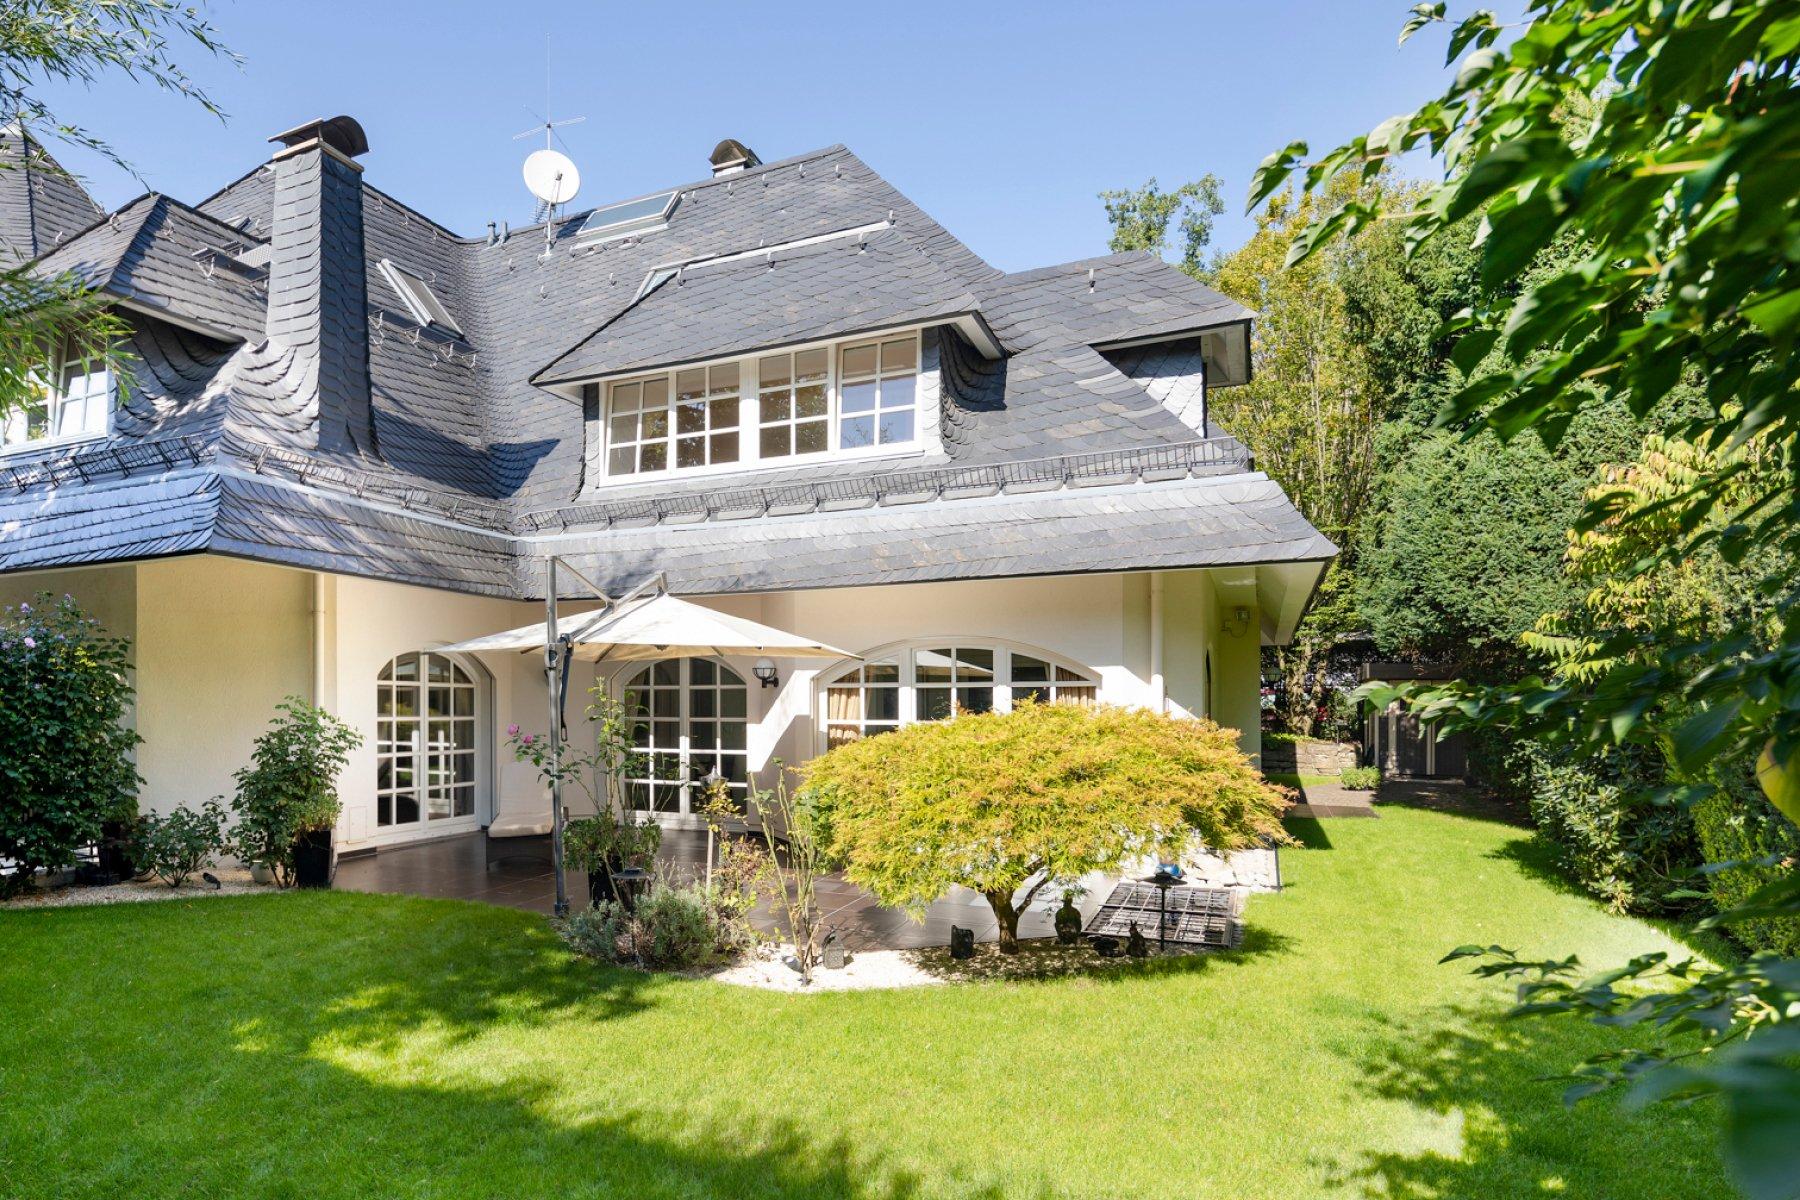 House in Bad Homburg, Hessen, Germany 1